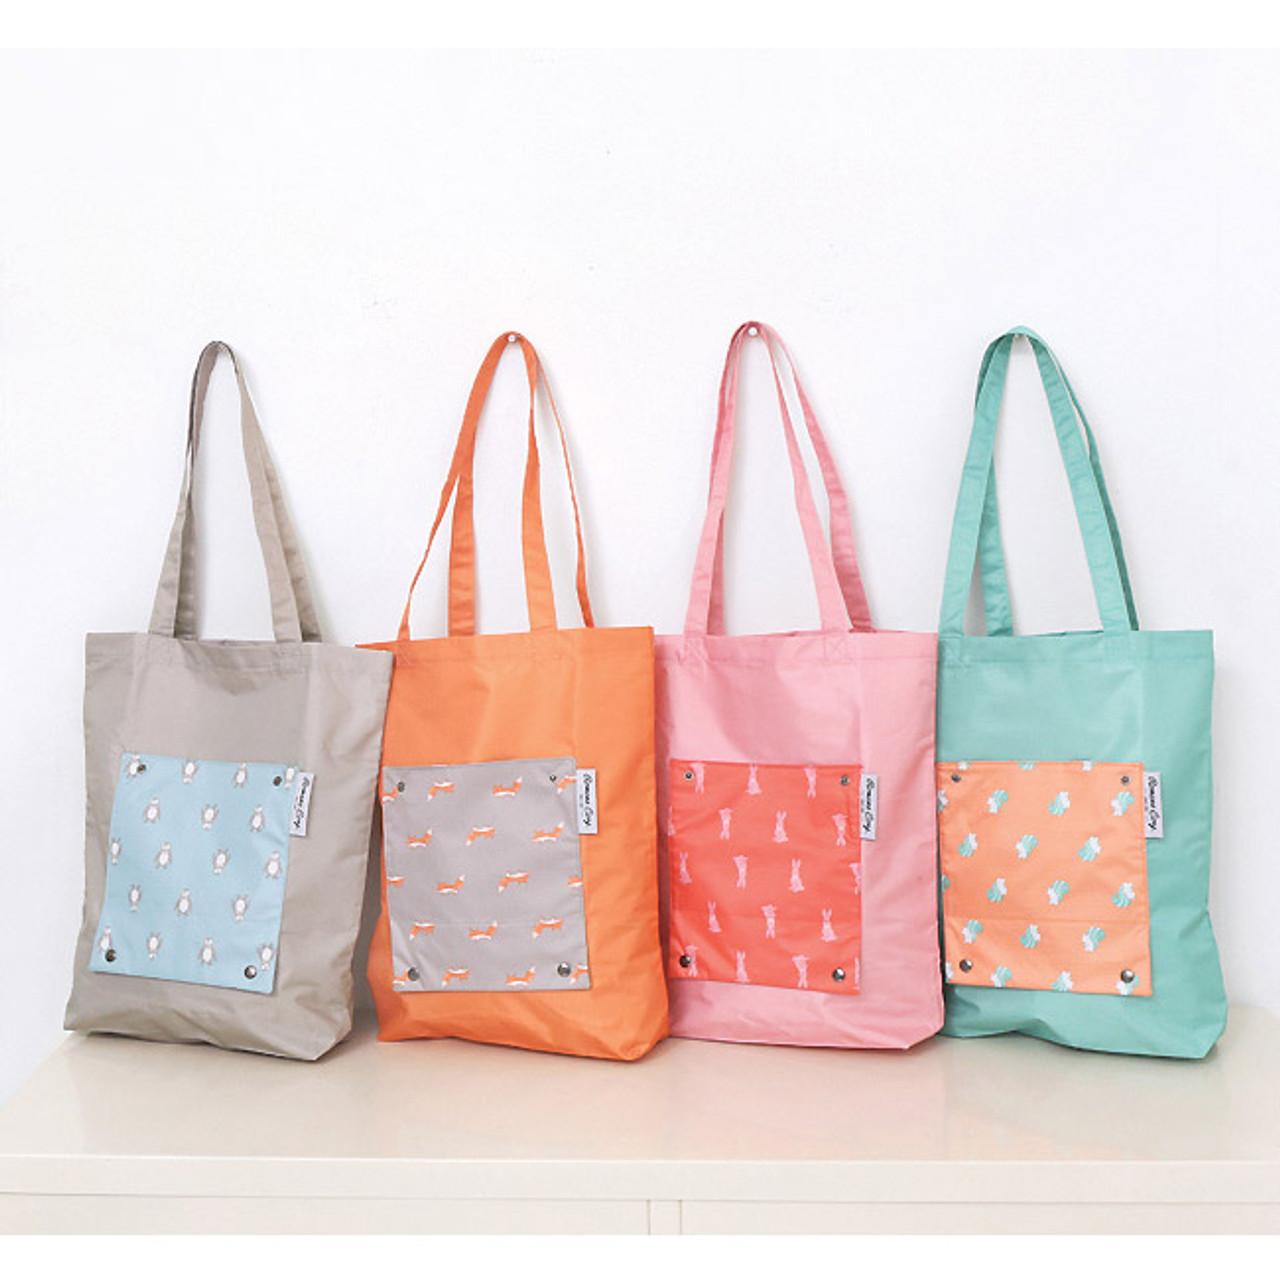 8a578c464 Romane Mr.wood pocket foldable eco tote bag - fallindesign